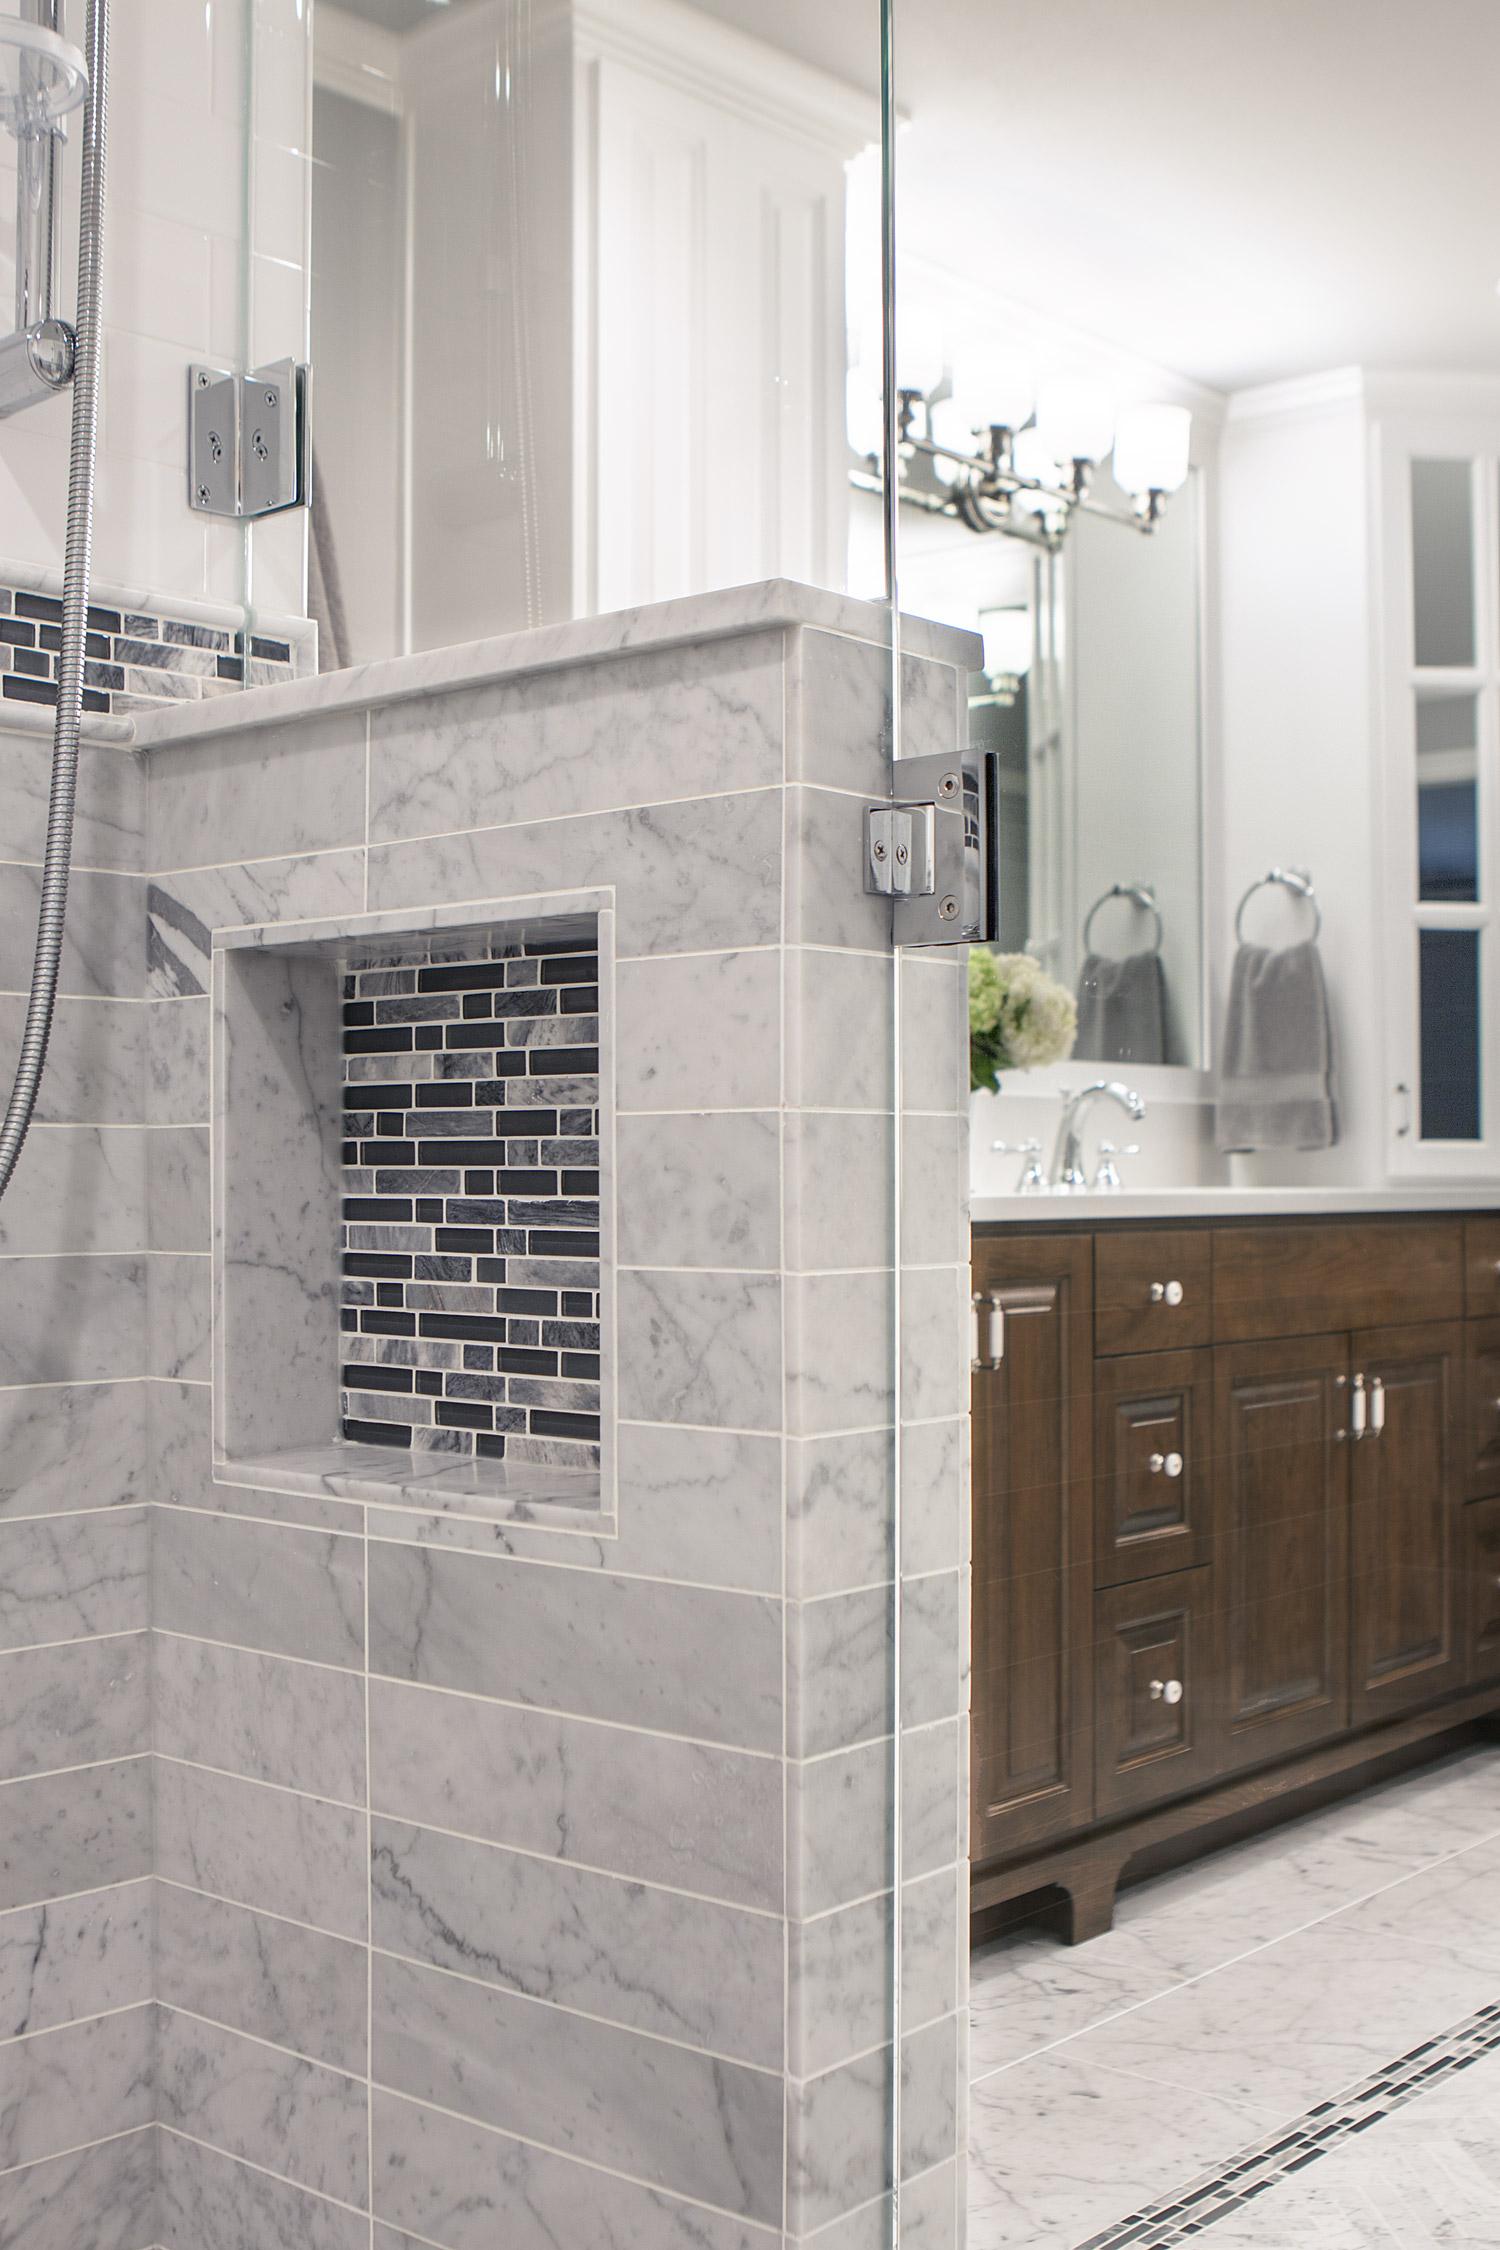 Bath-Detail-Shower-Caddy-1.2.jpg